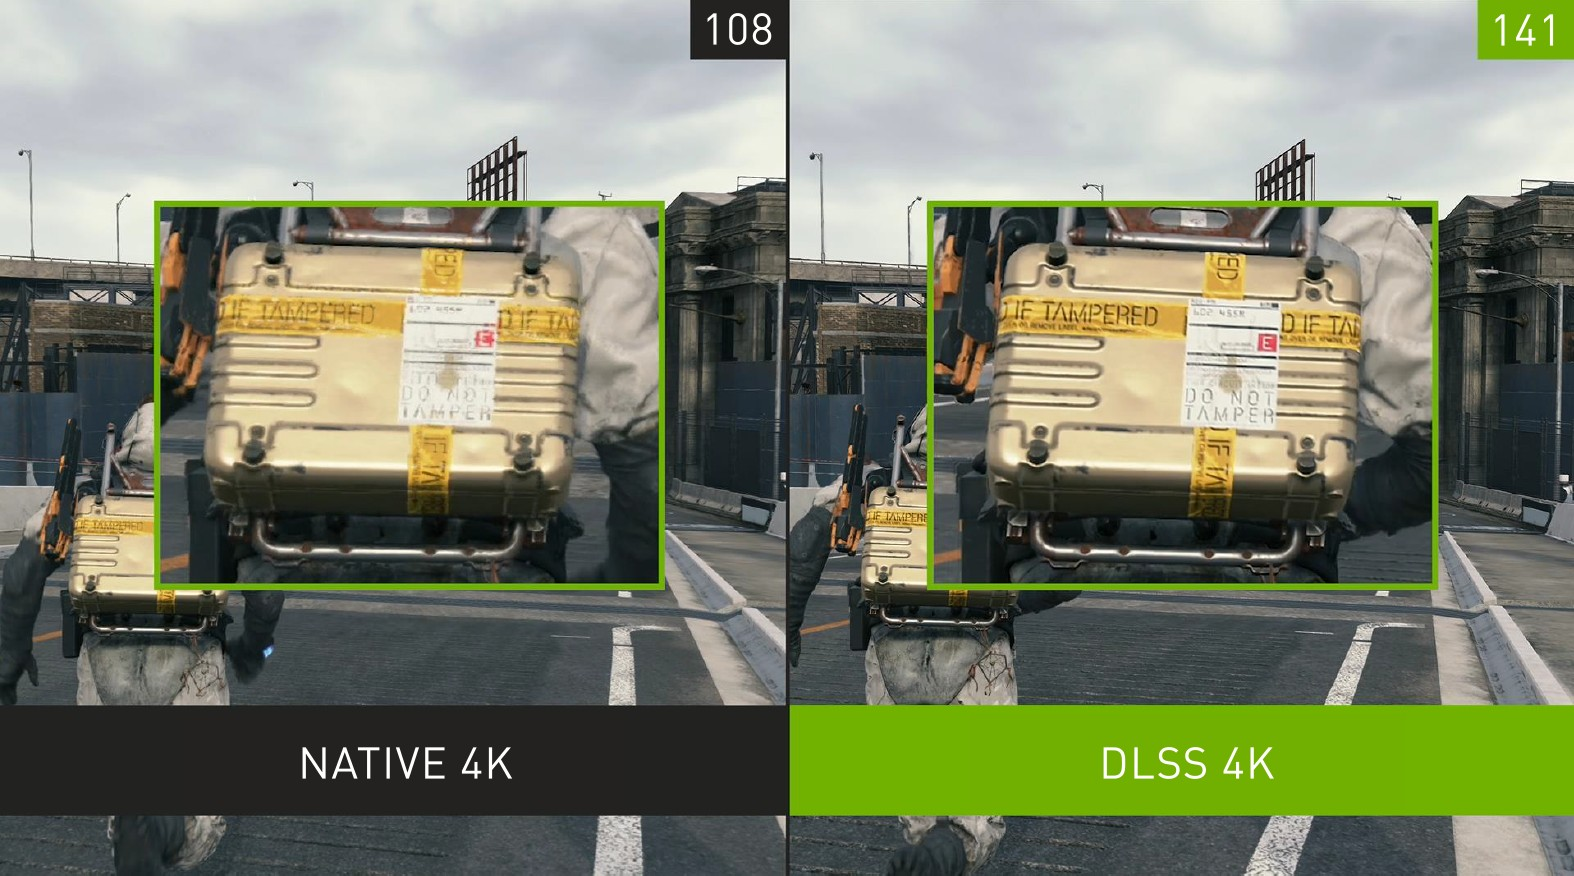 NVIDIA DLSS 4K